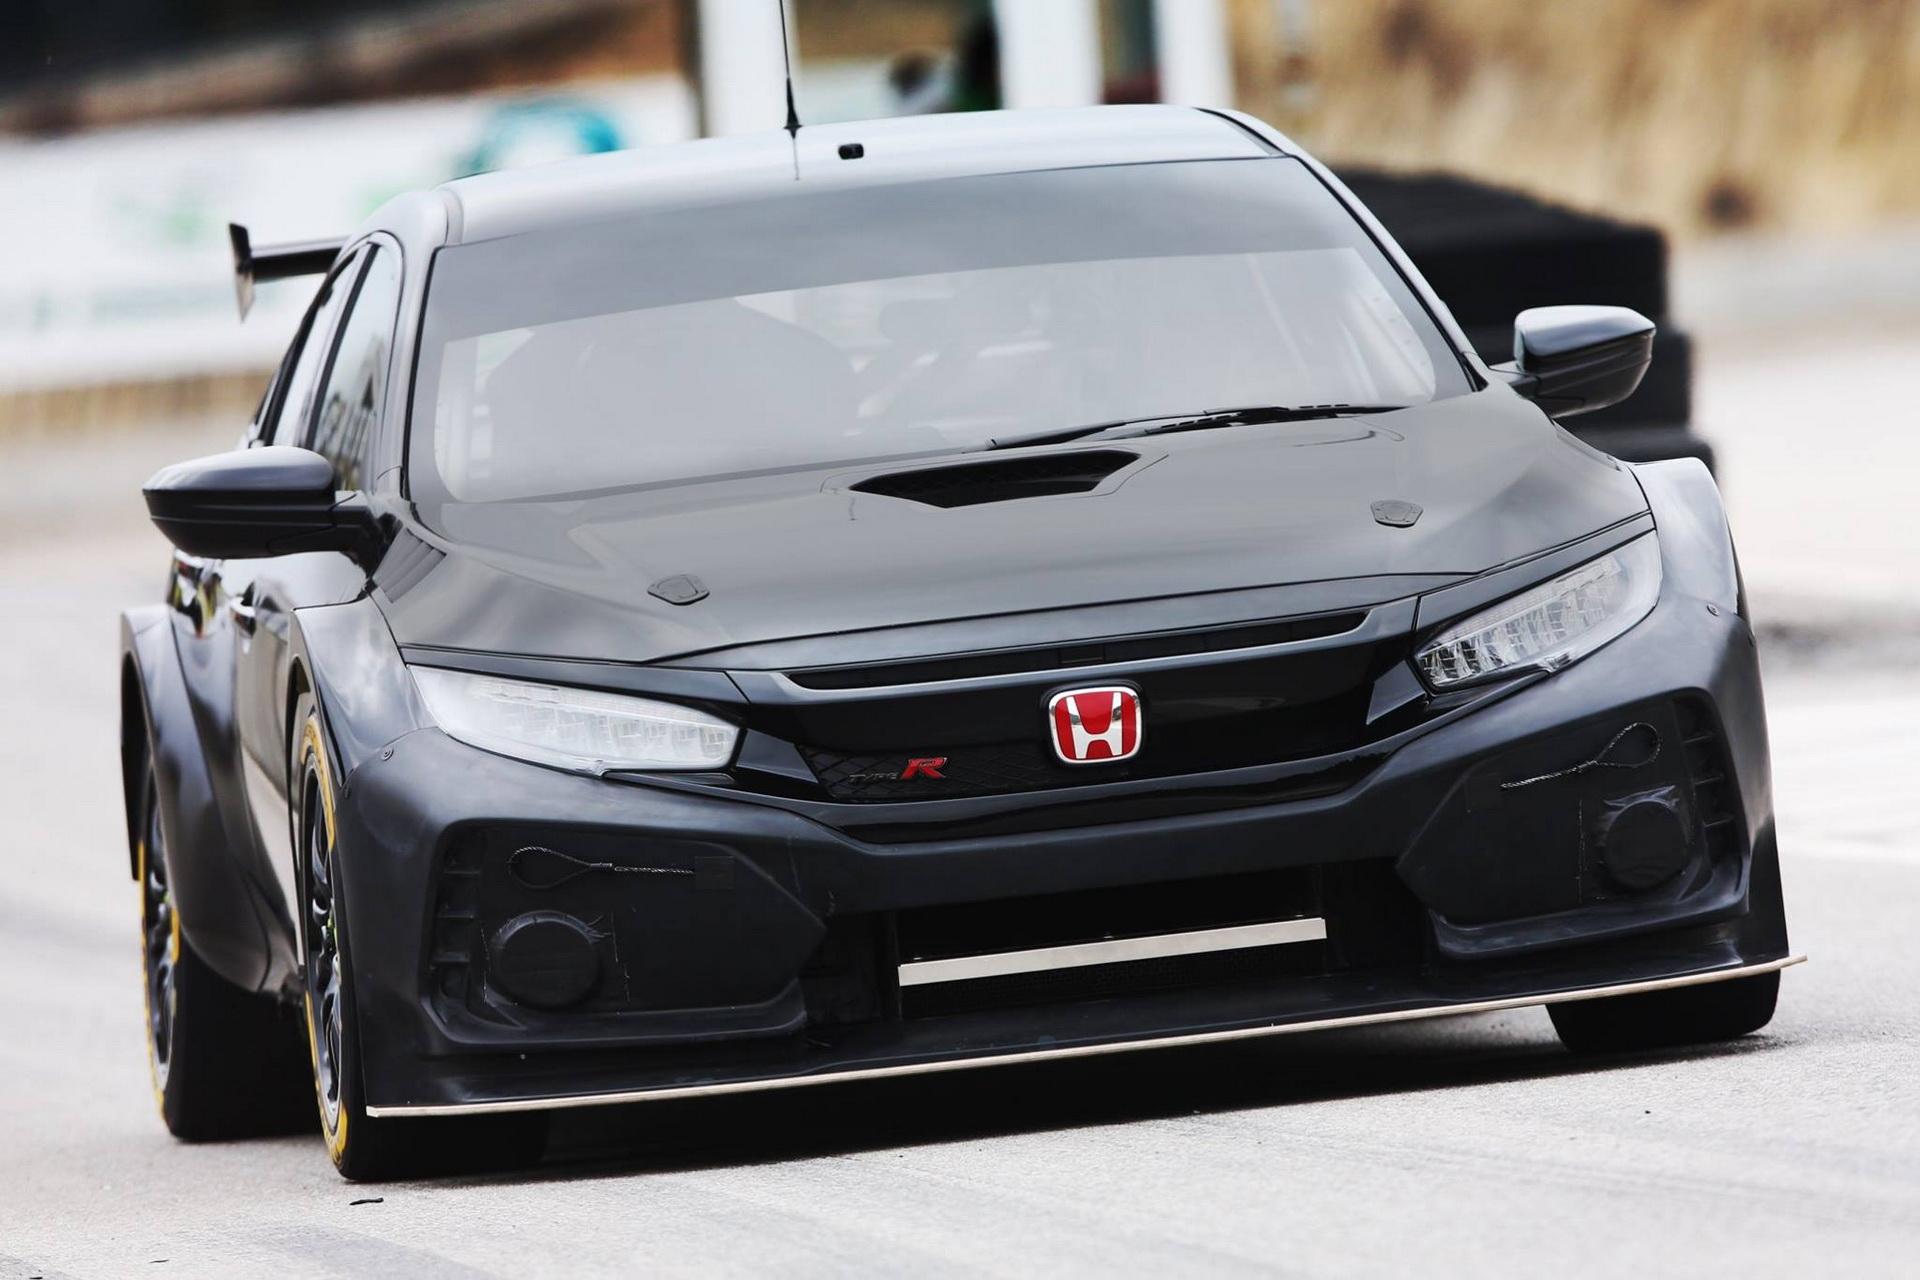 2018 honda civic type r btcc racing car unveiled